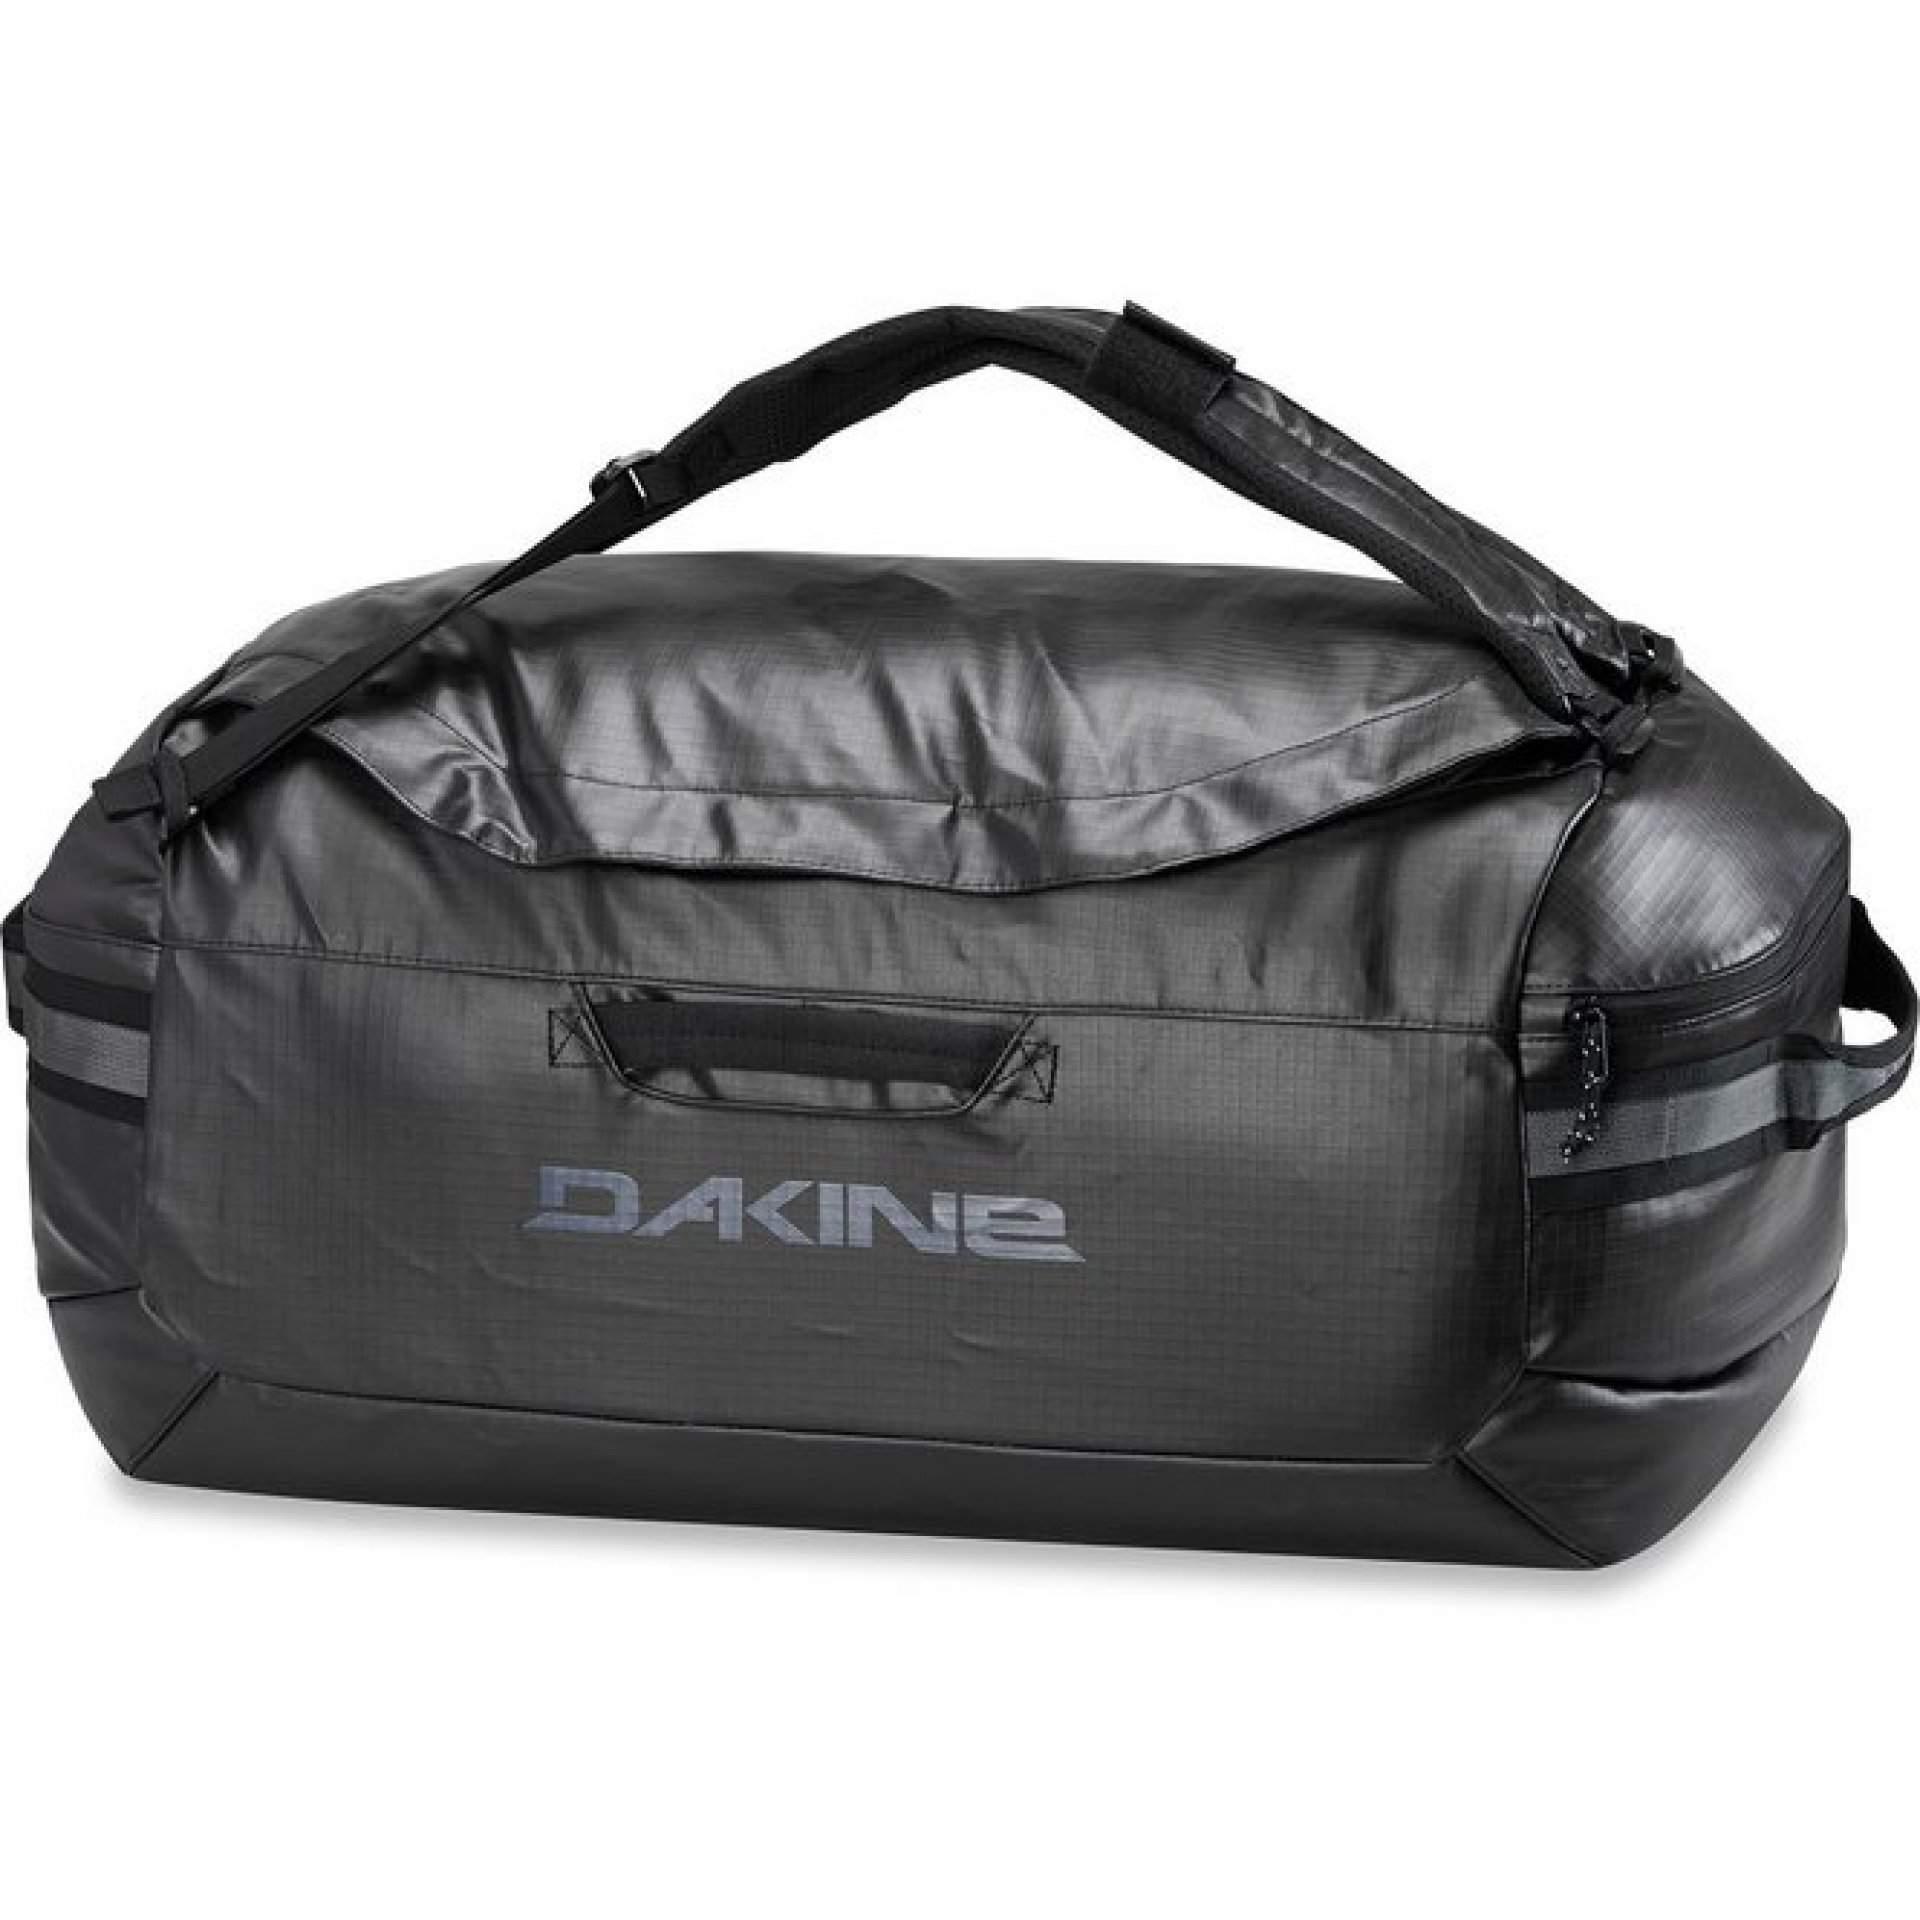 TORBA DAKINE RANGER DUFFLE 90L BLACK 2